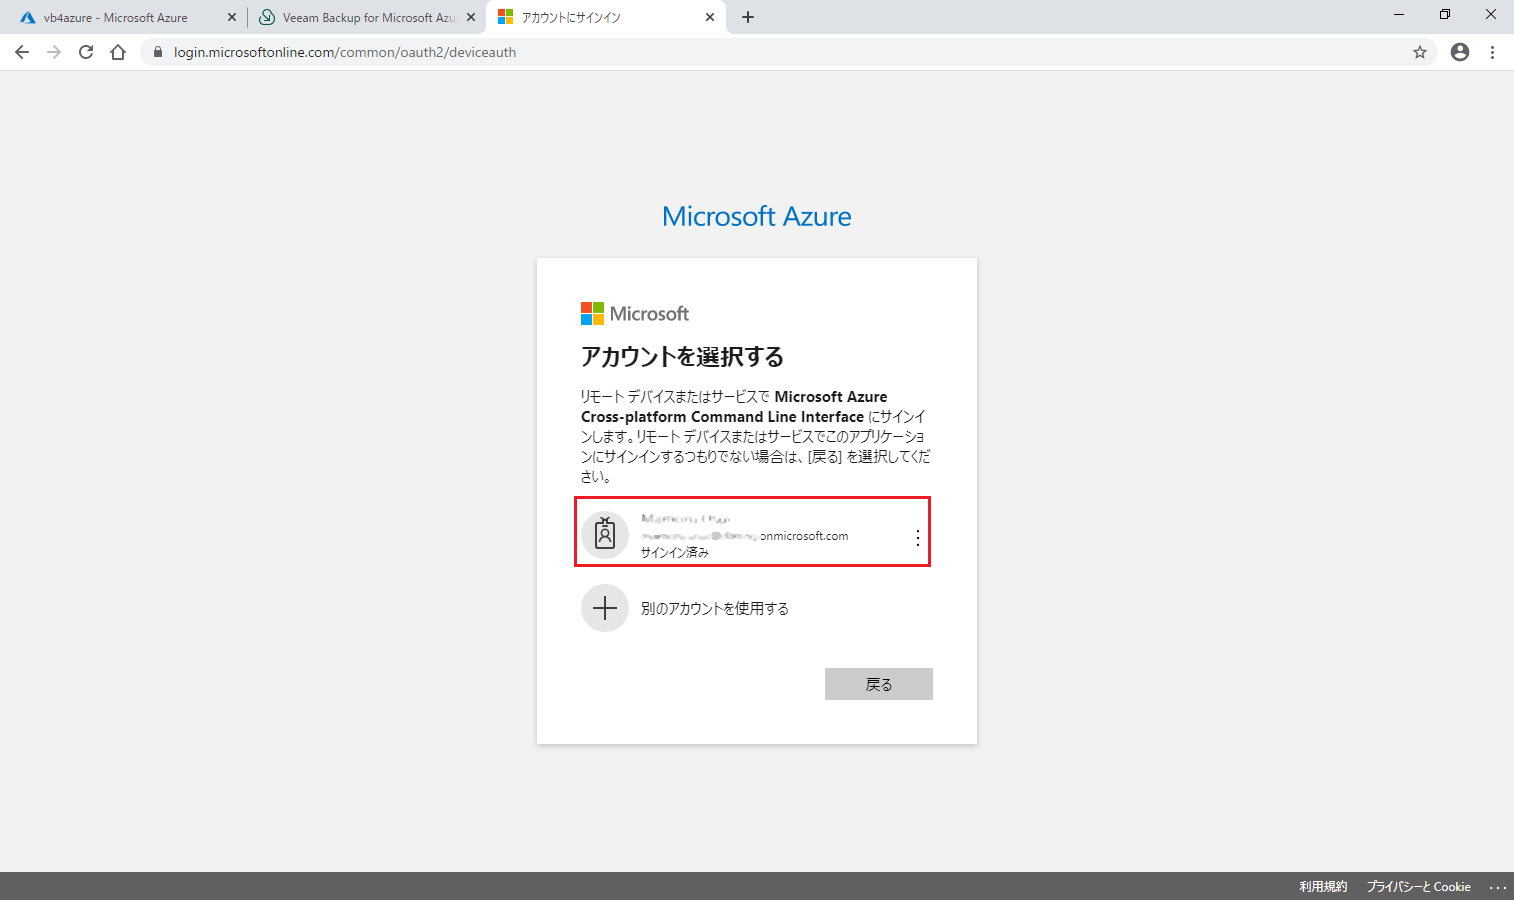 https://licensecounter.jp/engineer-voice/blog/uploads/init-config11.png